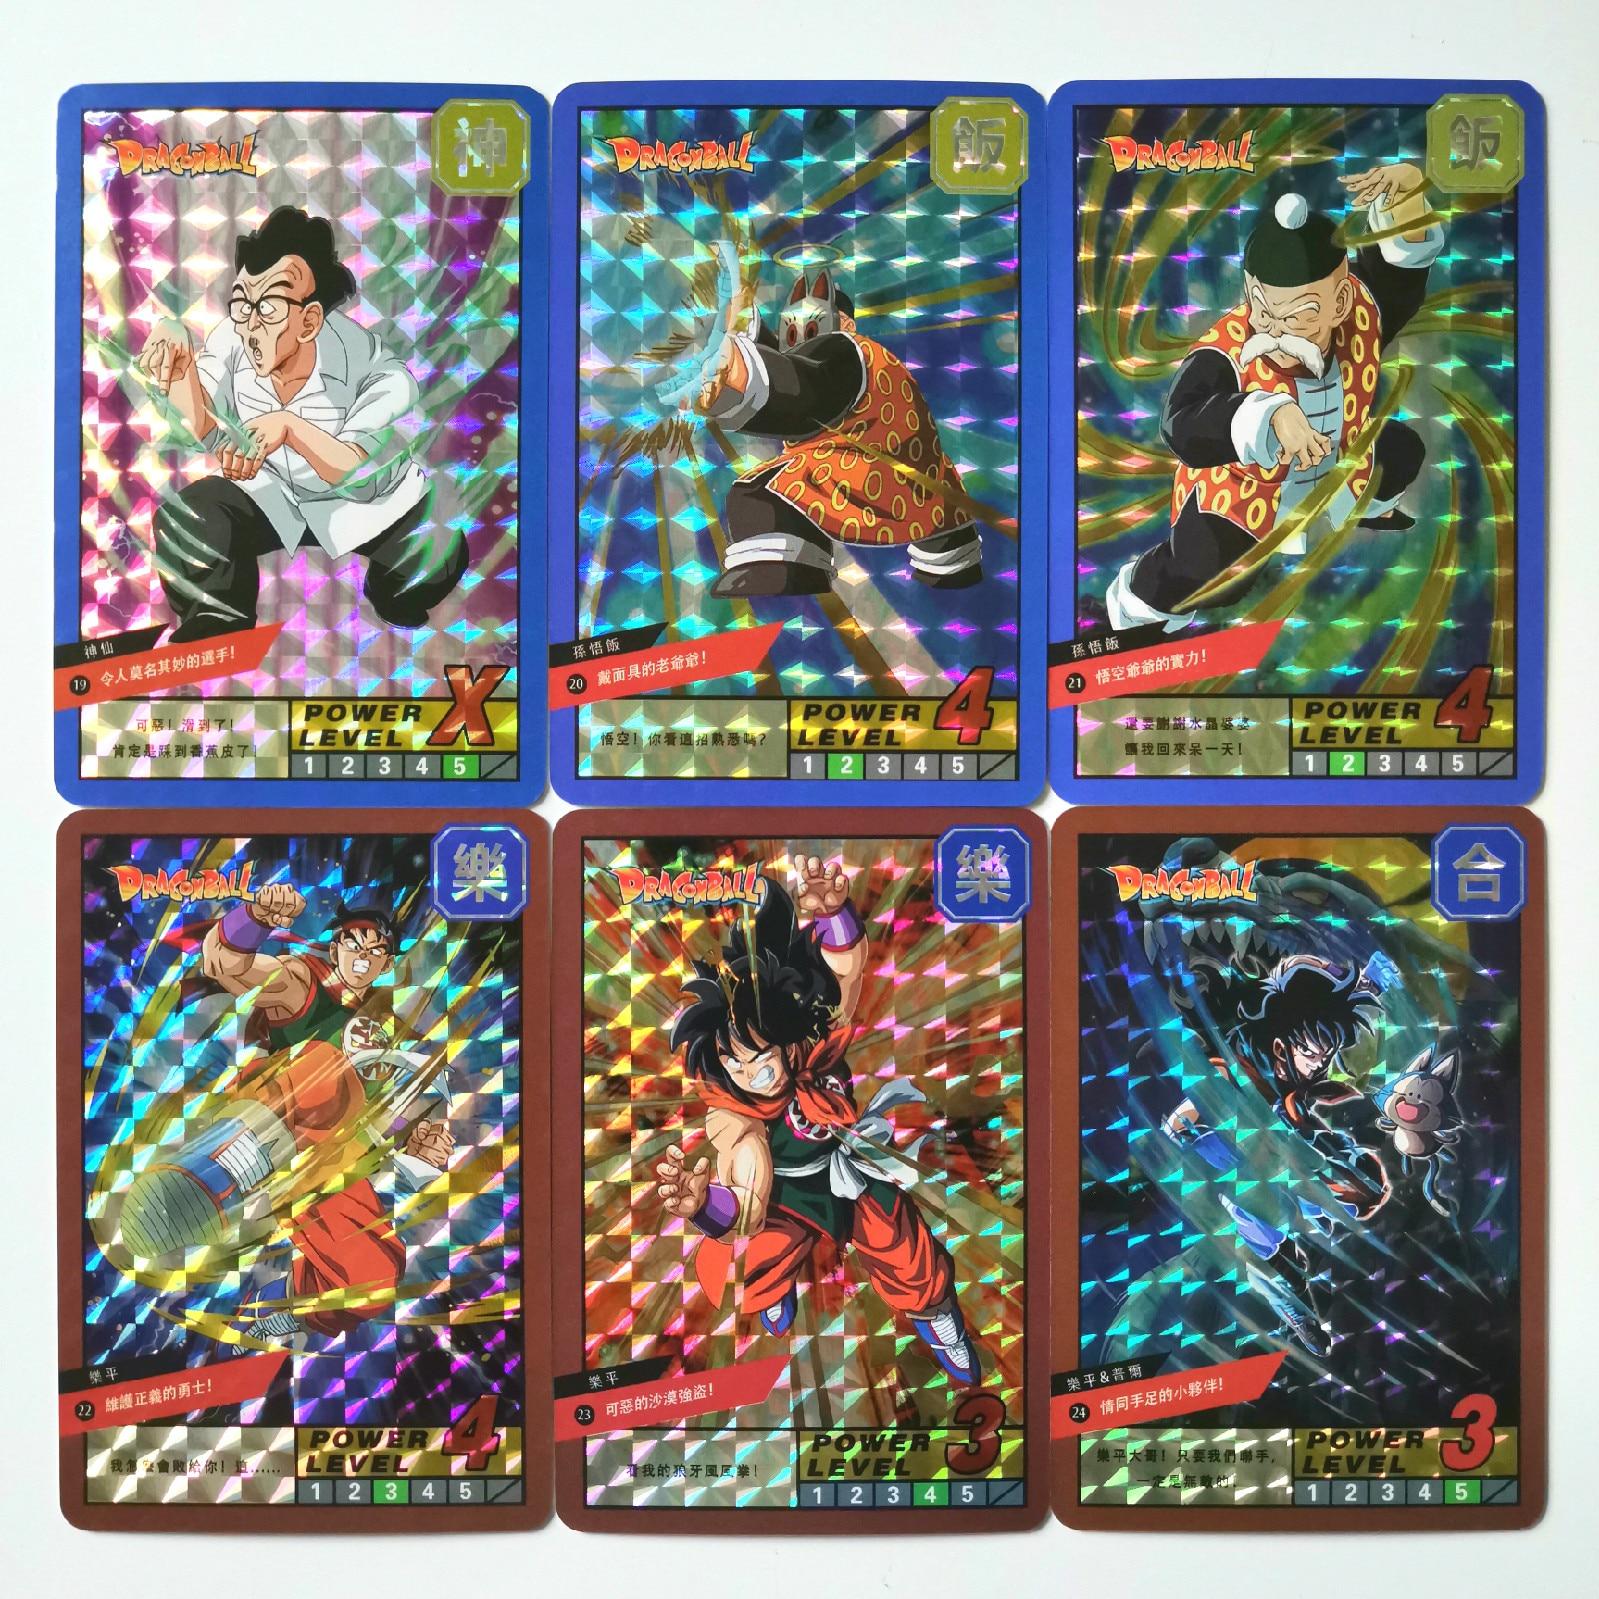 18pcs/set Super Dragon Ball Z Heroes Battle Card Ultra Instinct Goku Vegeta Game Collection Cards